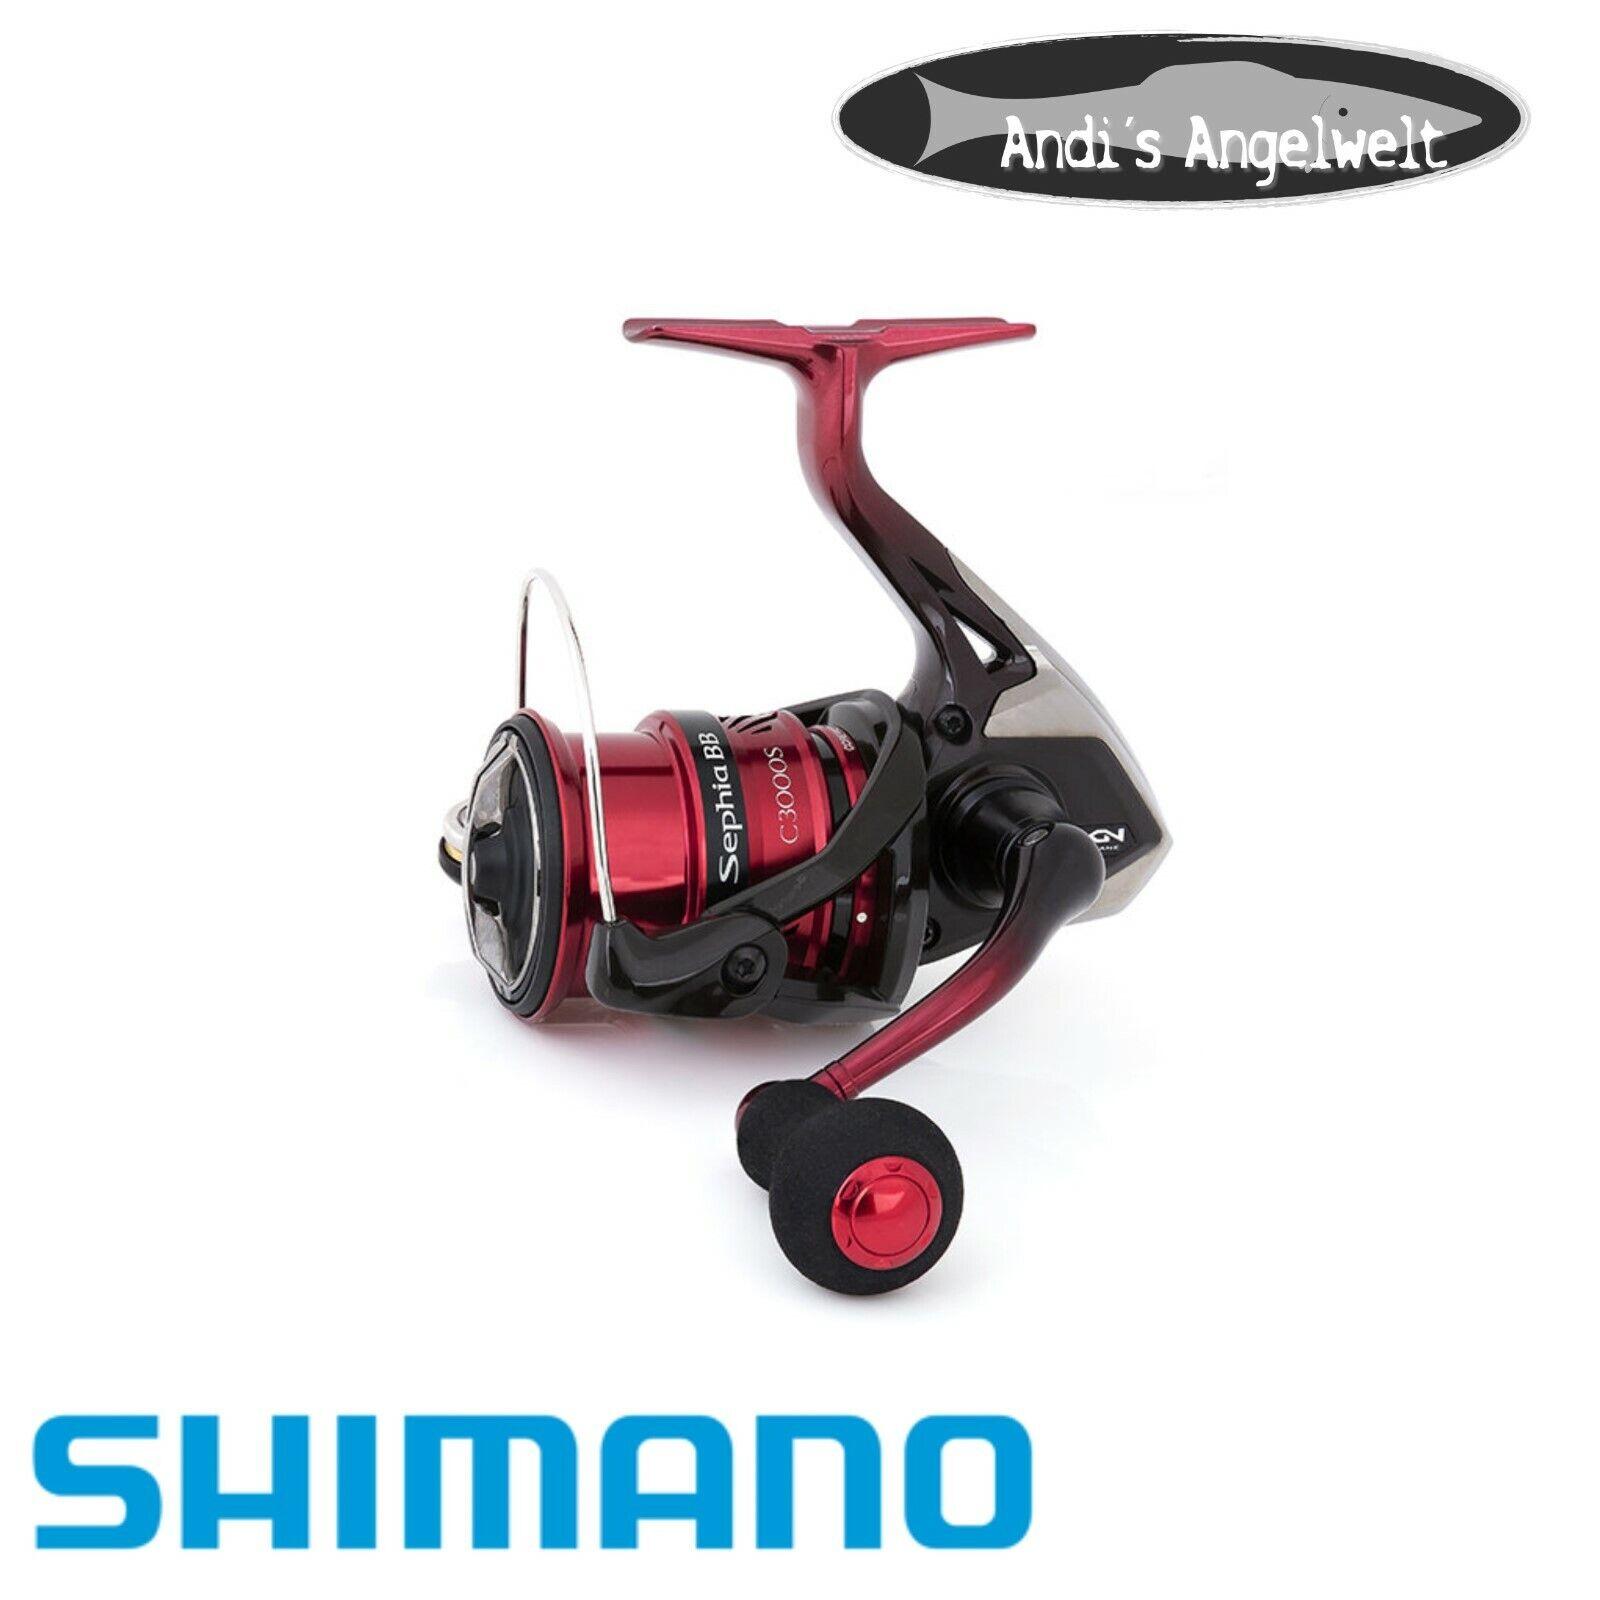 Shimano FX Angelrolle 1000FC 2000FC 2500FC 2500HG FC C3000FC 4000FC NEU 2020 !